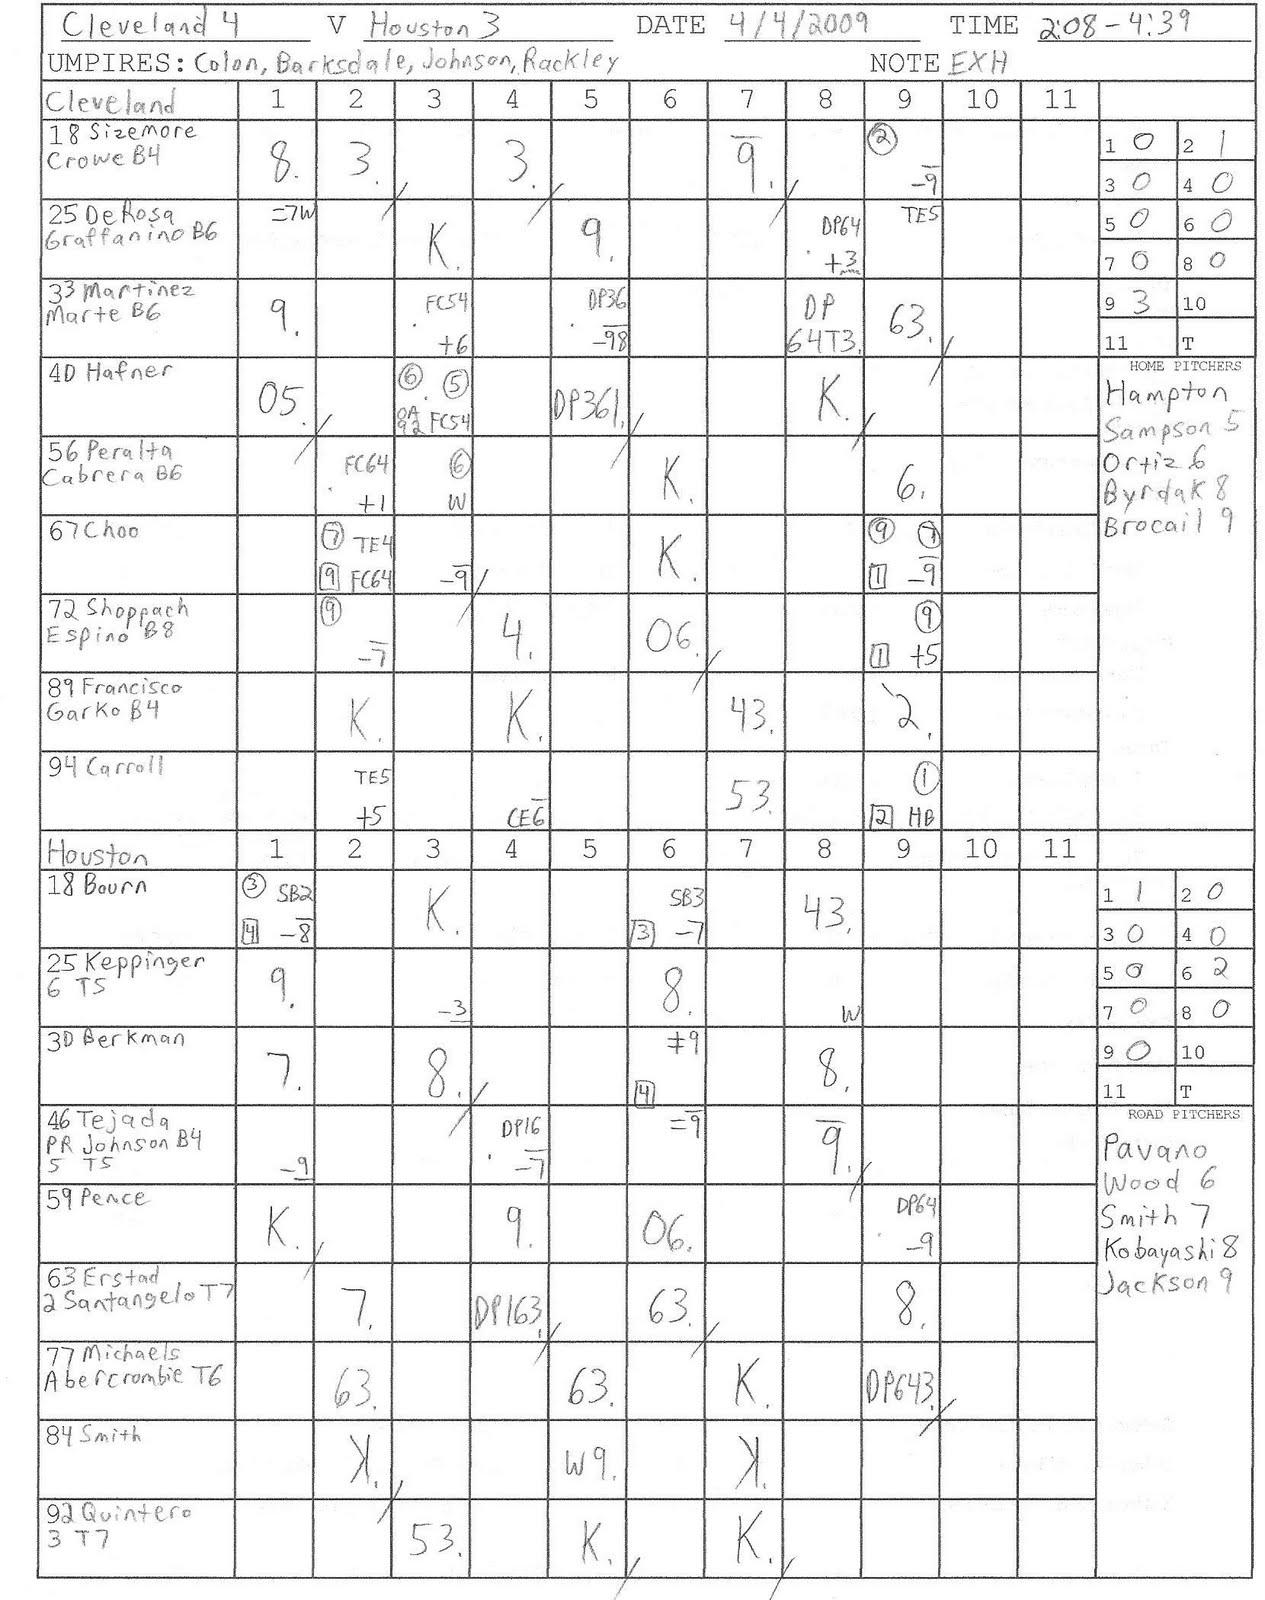 Weekly Scoresheet